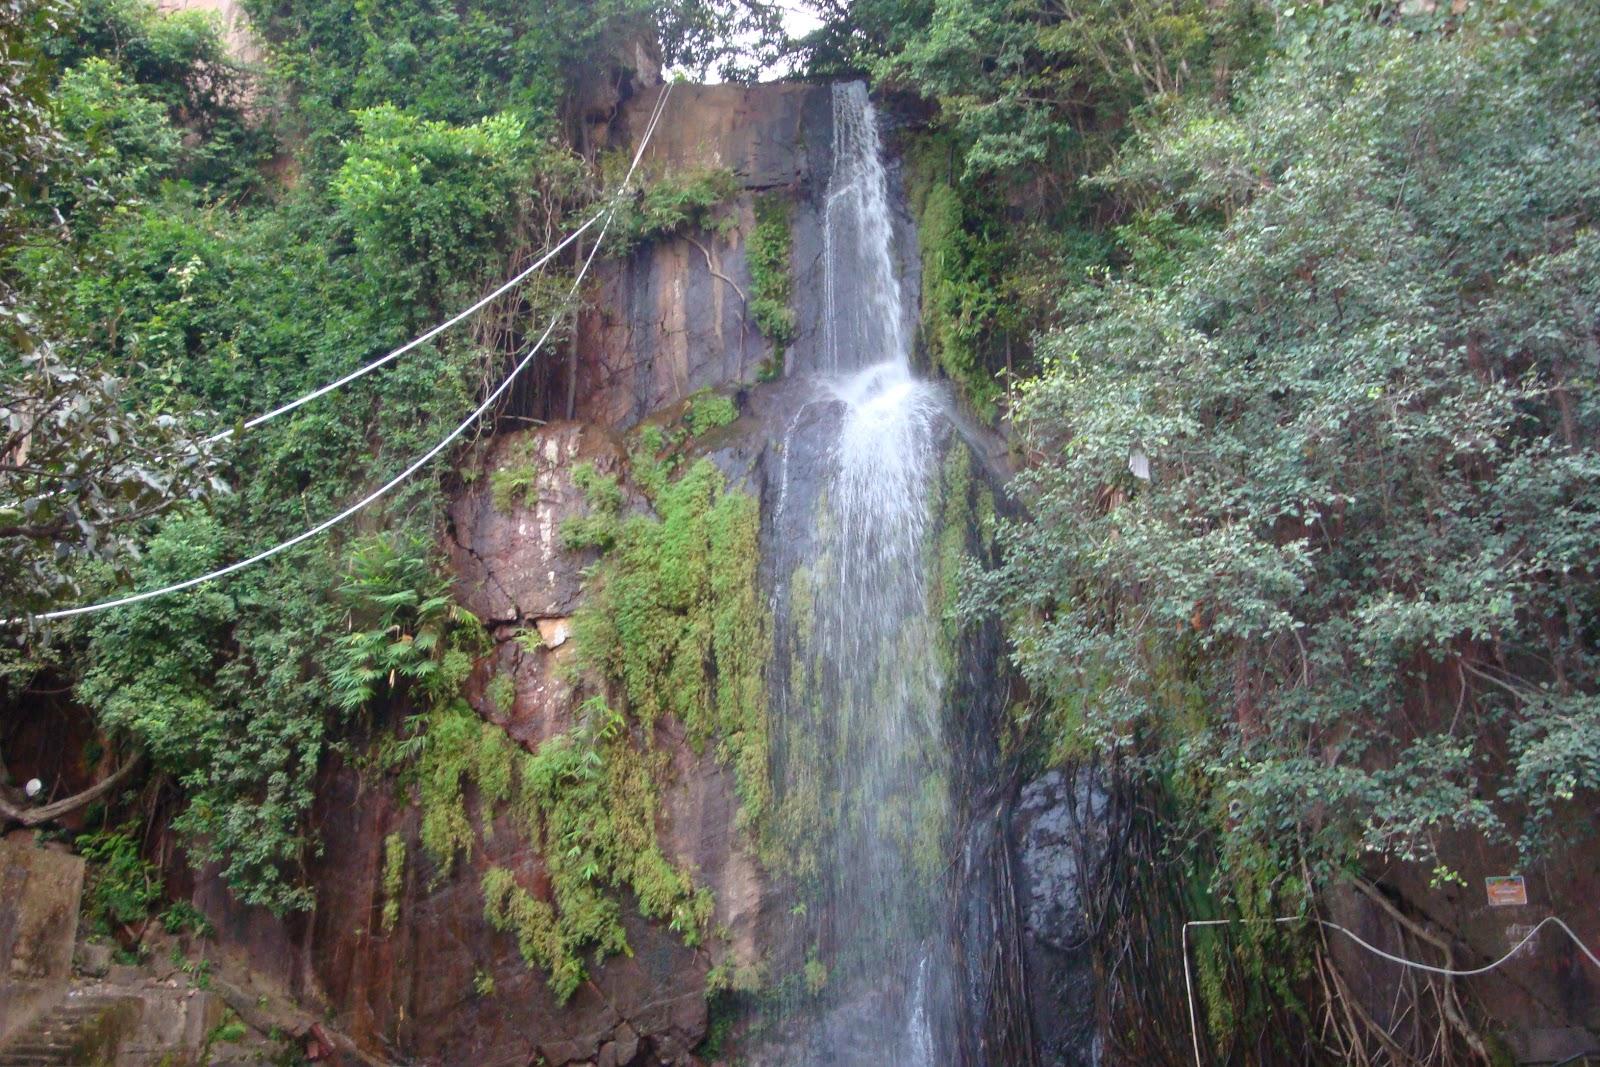 Kakolat Falls